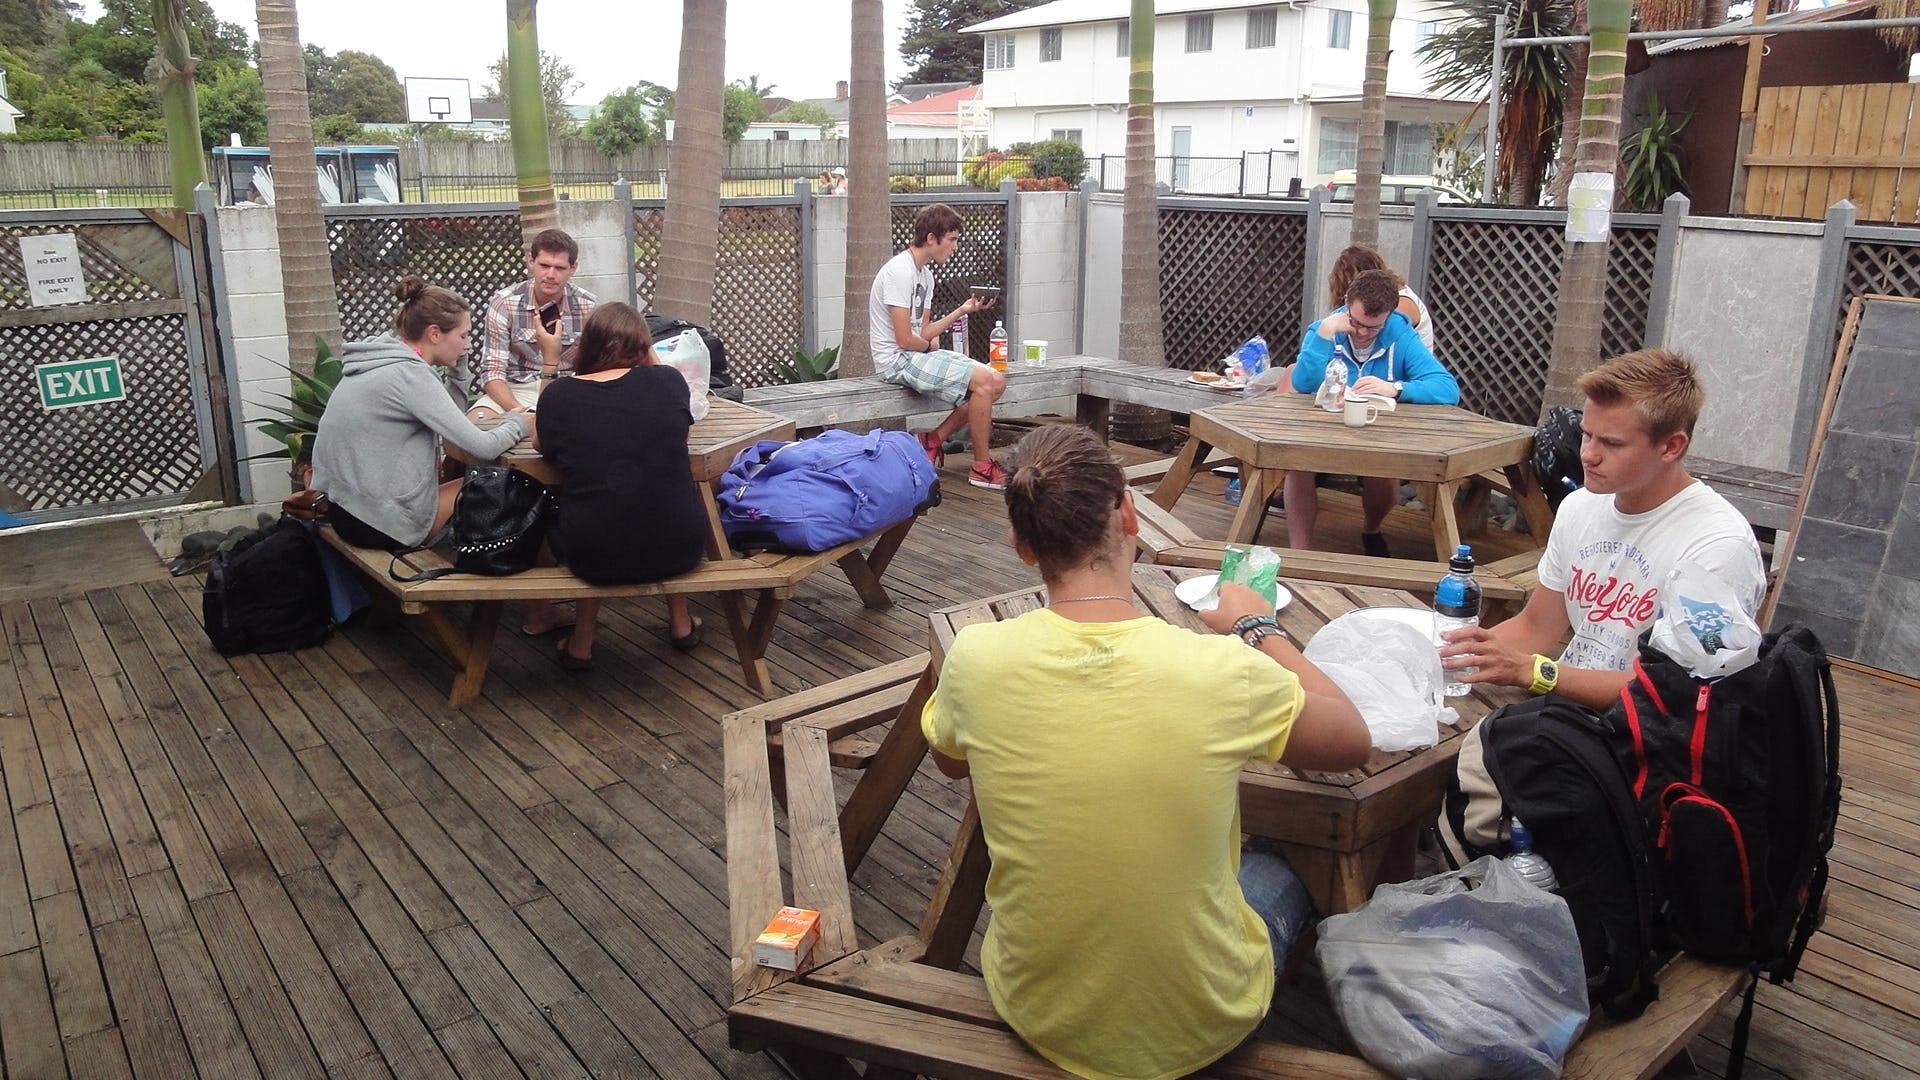 Base岛屿湾背包客旅馆的桌子